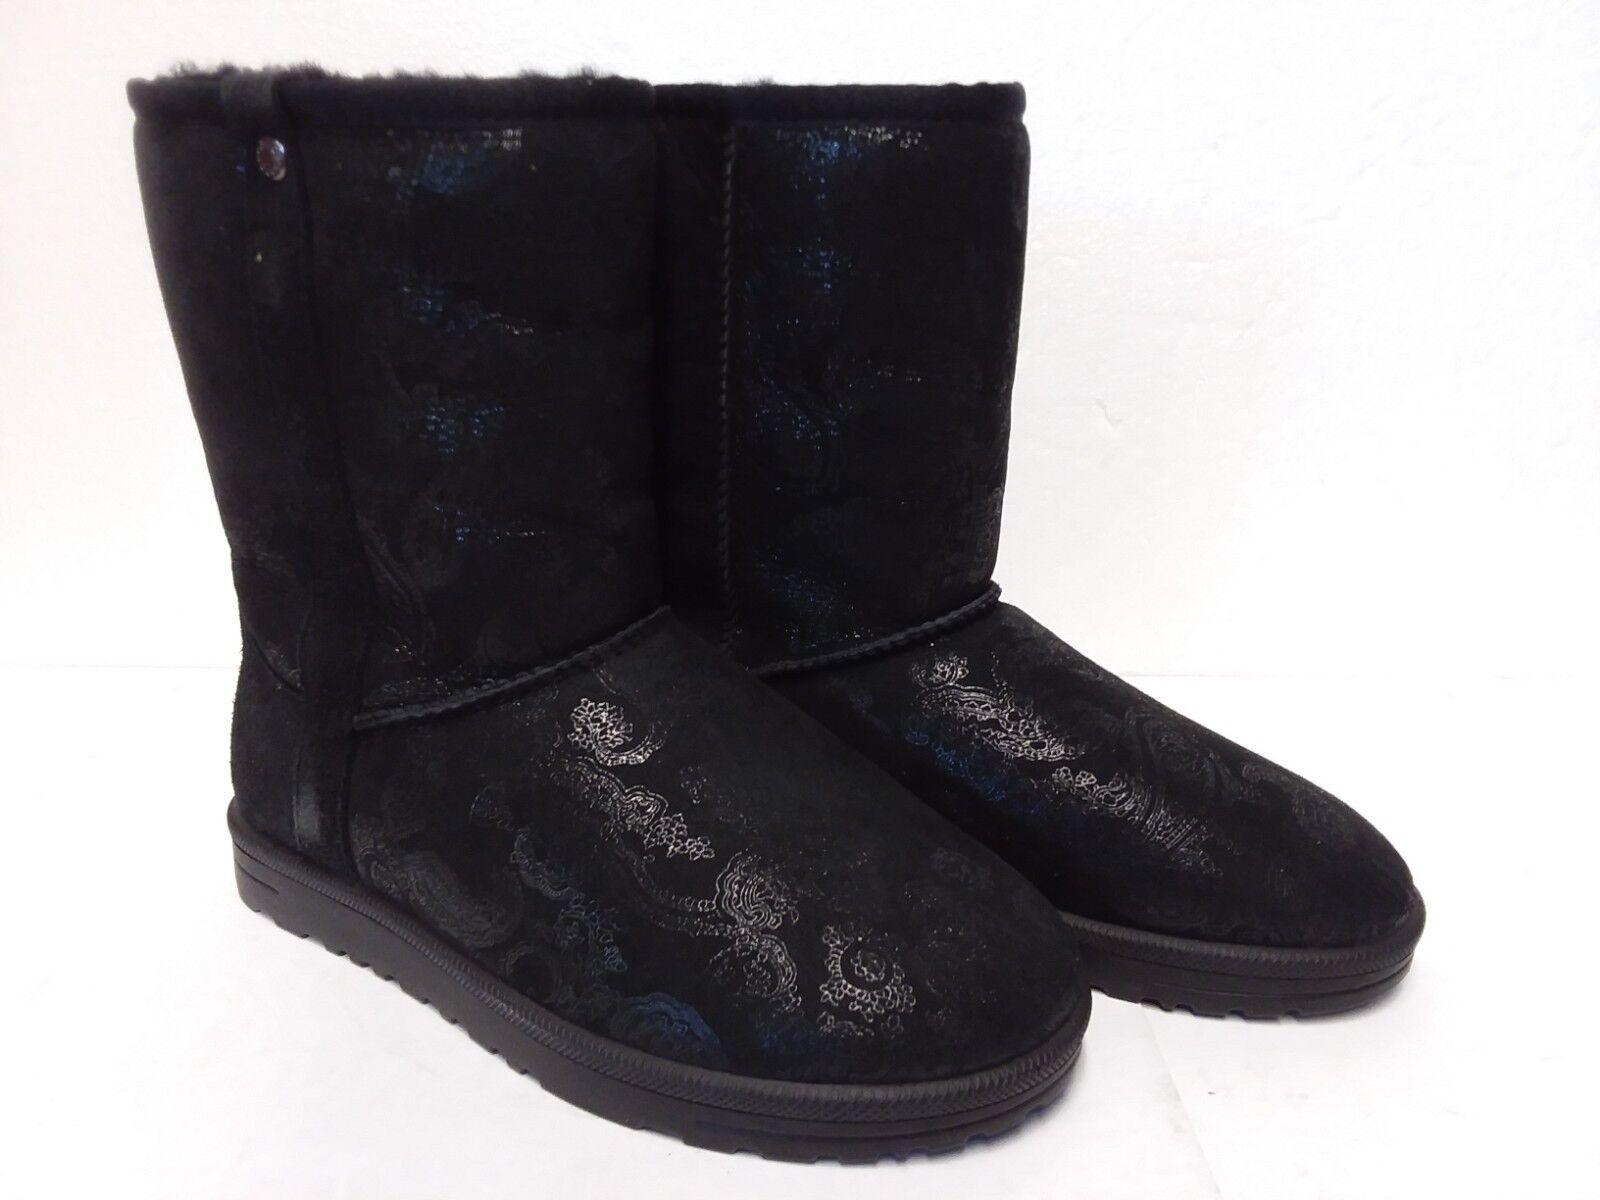 ABEO B.I.O. System ® noir pour femme Whistler Bottes Taille 6